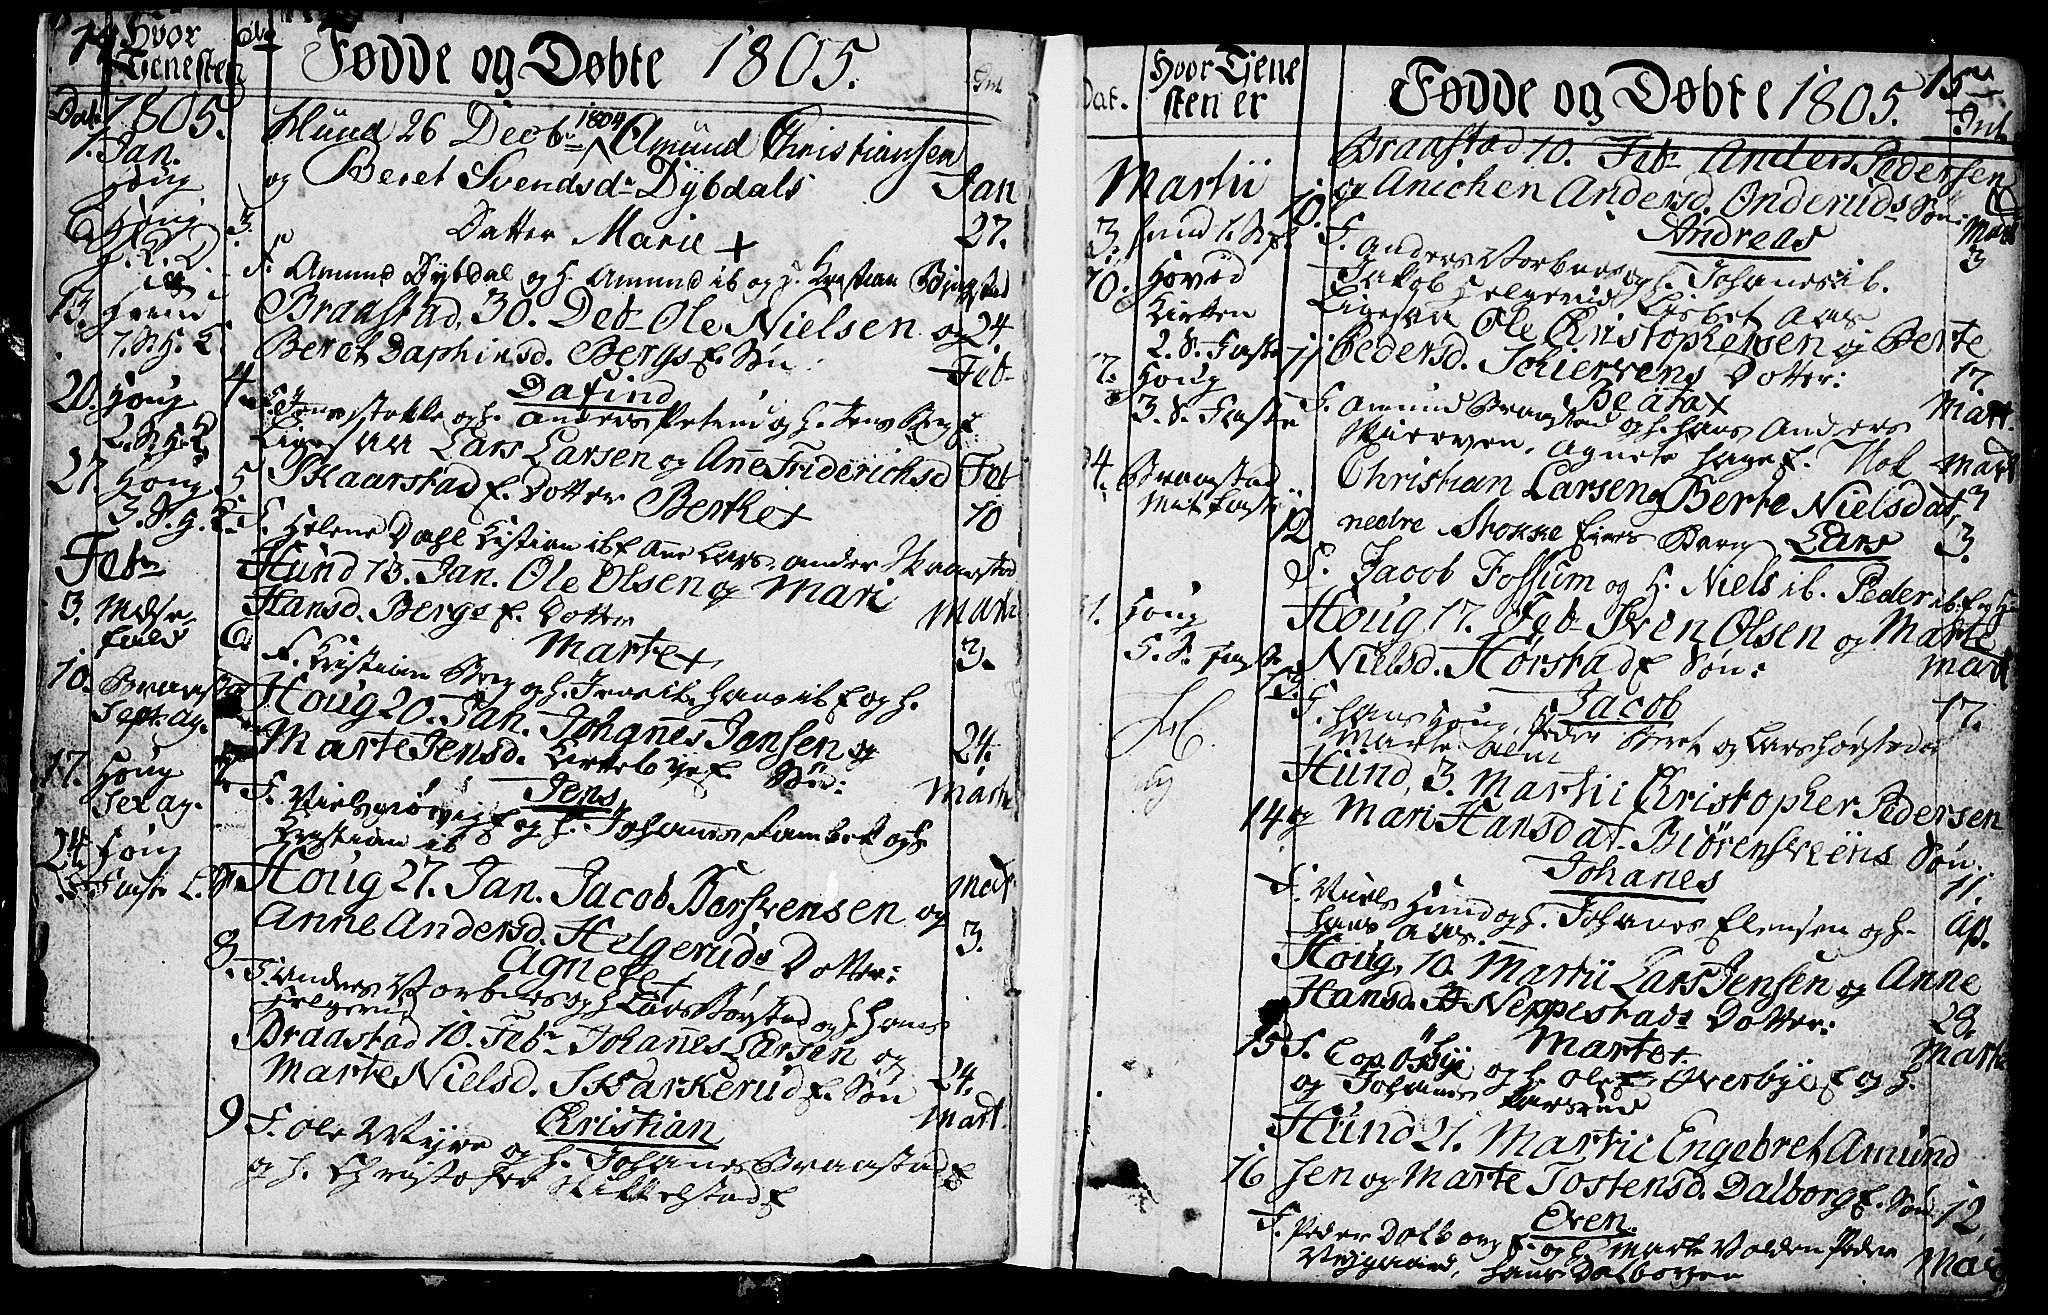 SAH, Vardal prestekontor, H/Ha/Hab/L0003: Klokkerbok nr. 3, 1803-1808, s. 14-15